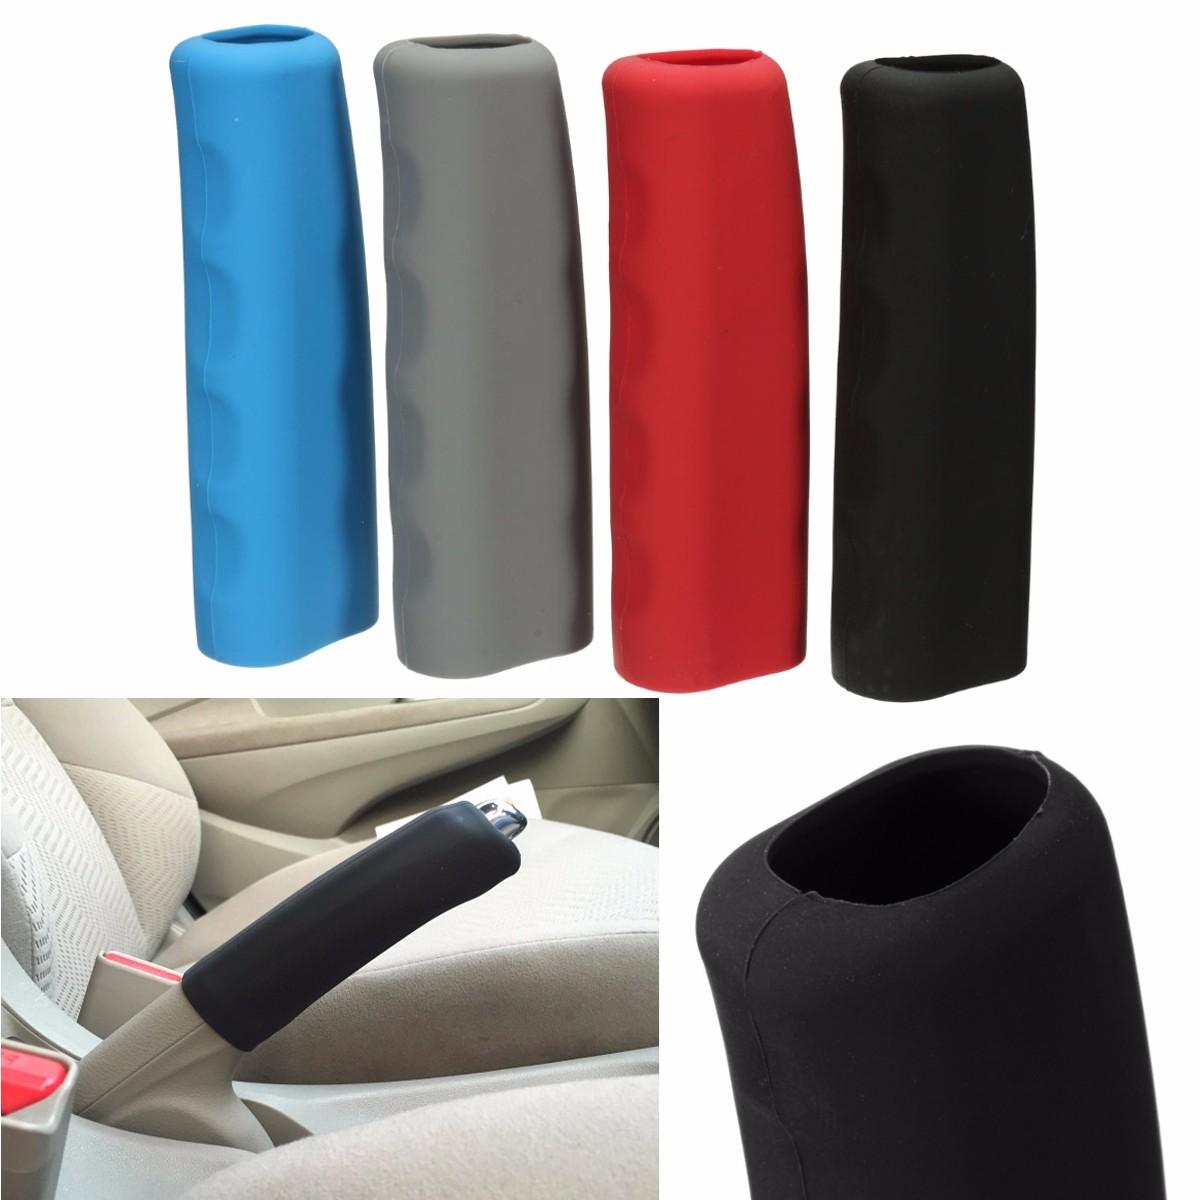 silicone anti slip car interior handbrake brake handle lever cover alex nld. Black Bedroom Furniture Sets. Home Design Ideas